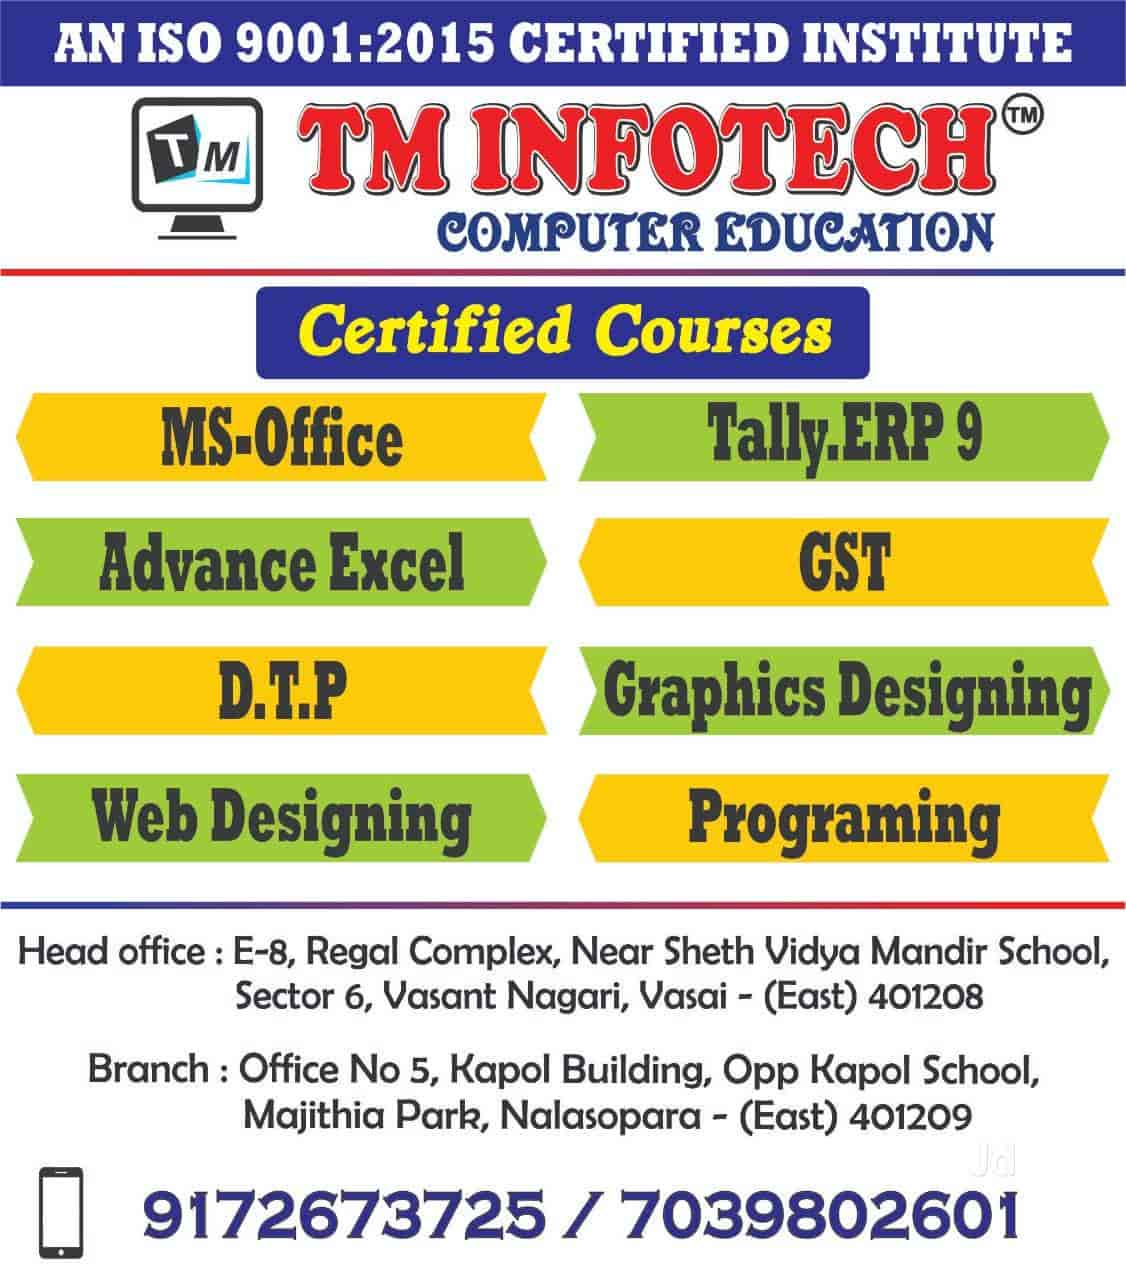 T M Infotech Computer Education Nalasopara East Computer Training Institutes In Palghar Mumbai Justdial